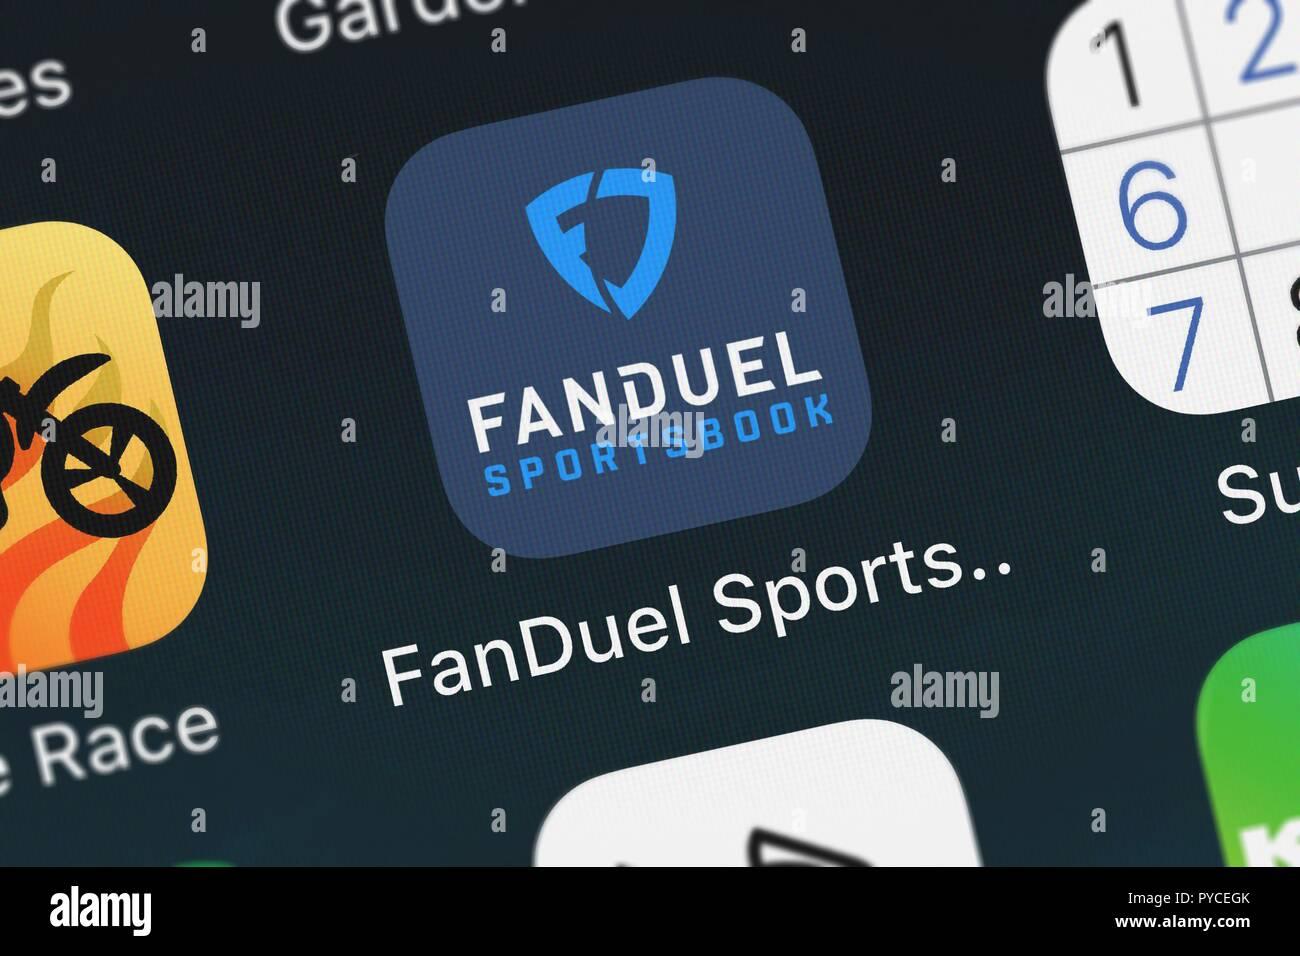 London, Großbritannien, 26. Oktober 2018: Nahaufnahme von FanDuel, Inc beliebte App FanDuel Sportwetten. Stockfoto